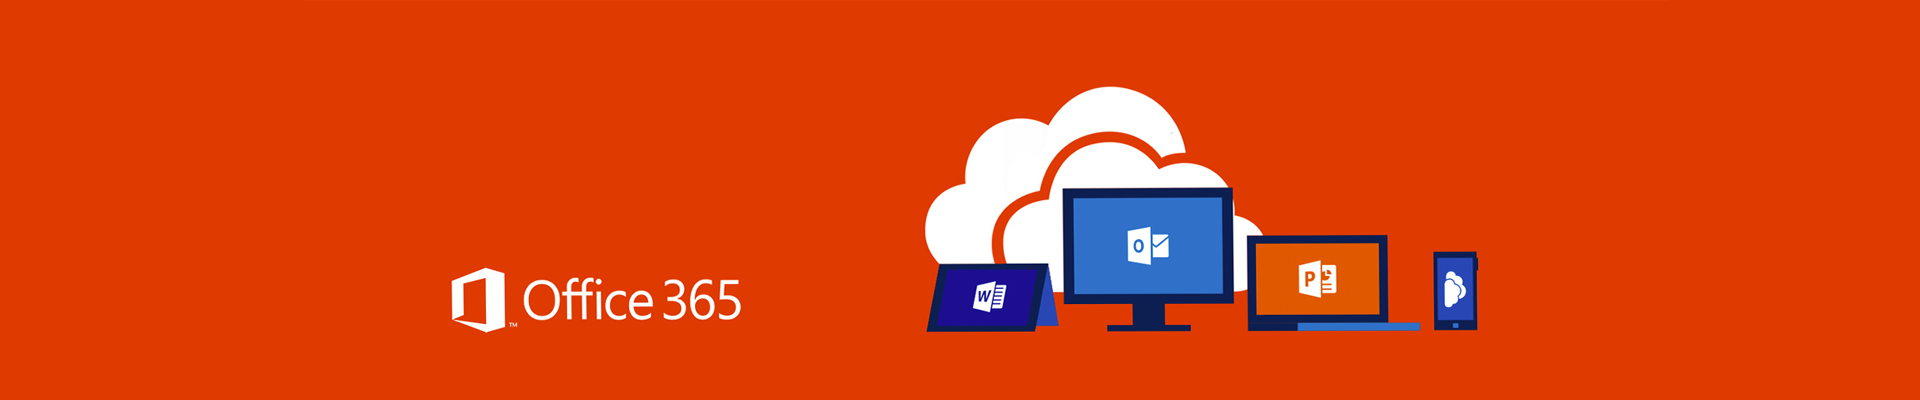 Ammann IT Services GmbH | Microsoft Office 365